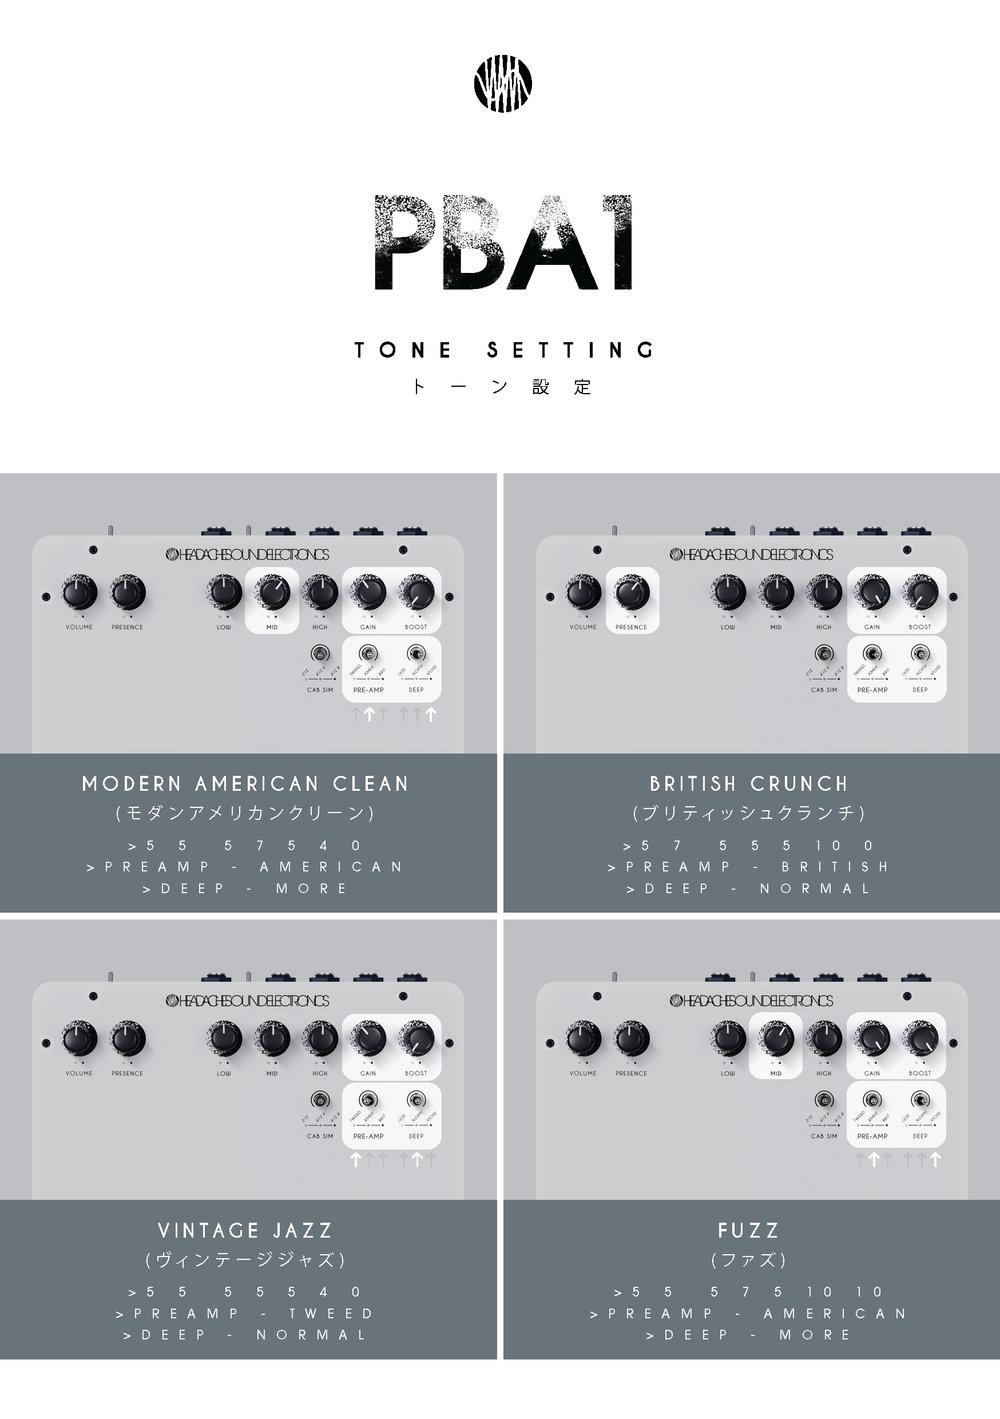 PBA1 - Tone Setting